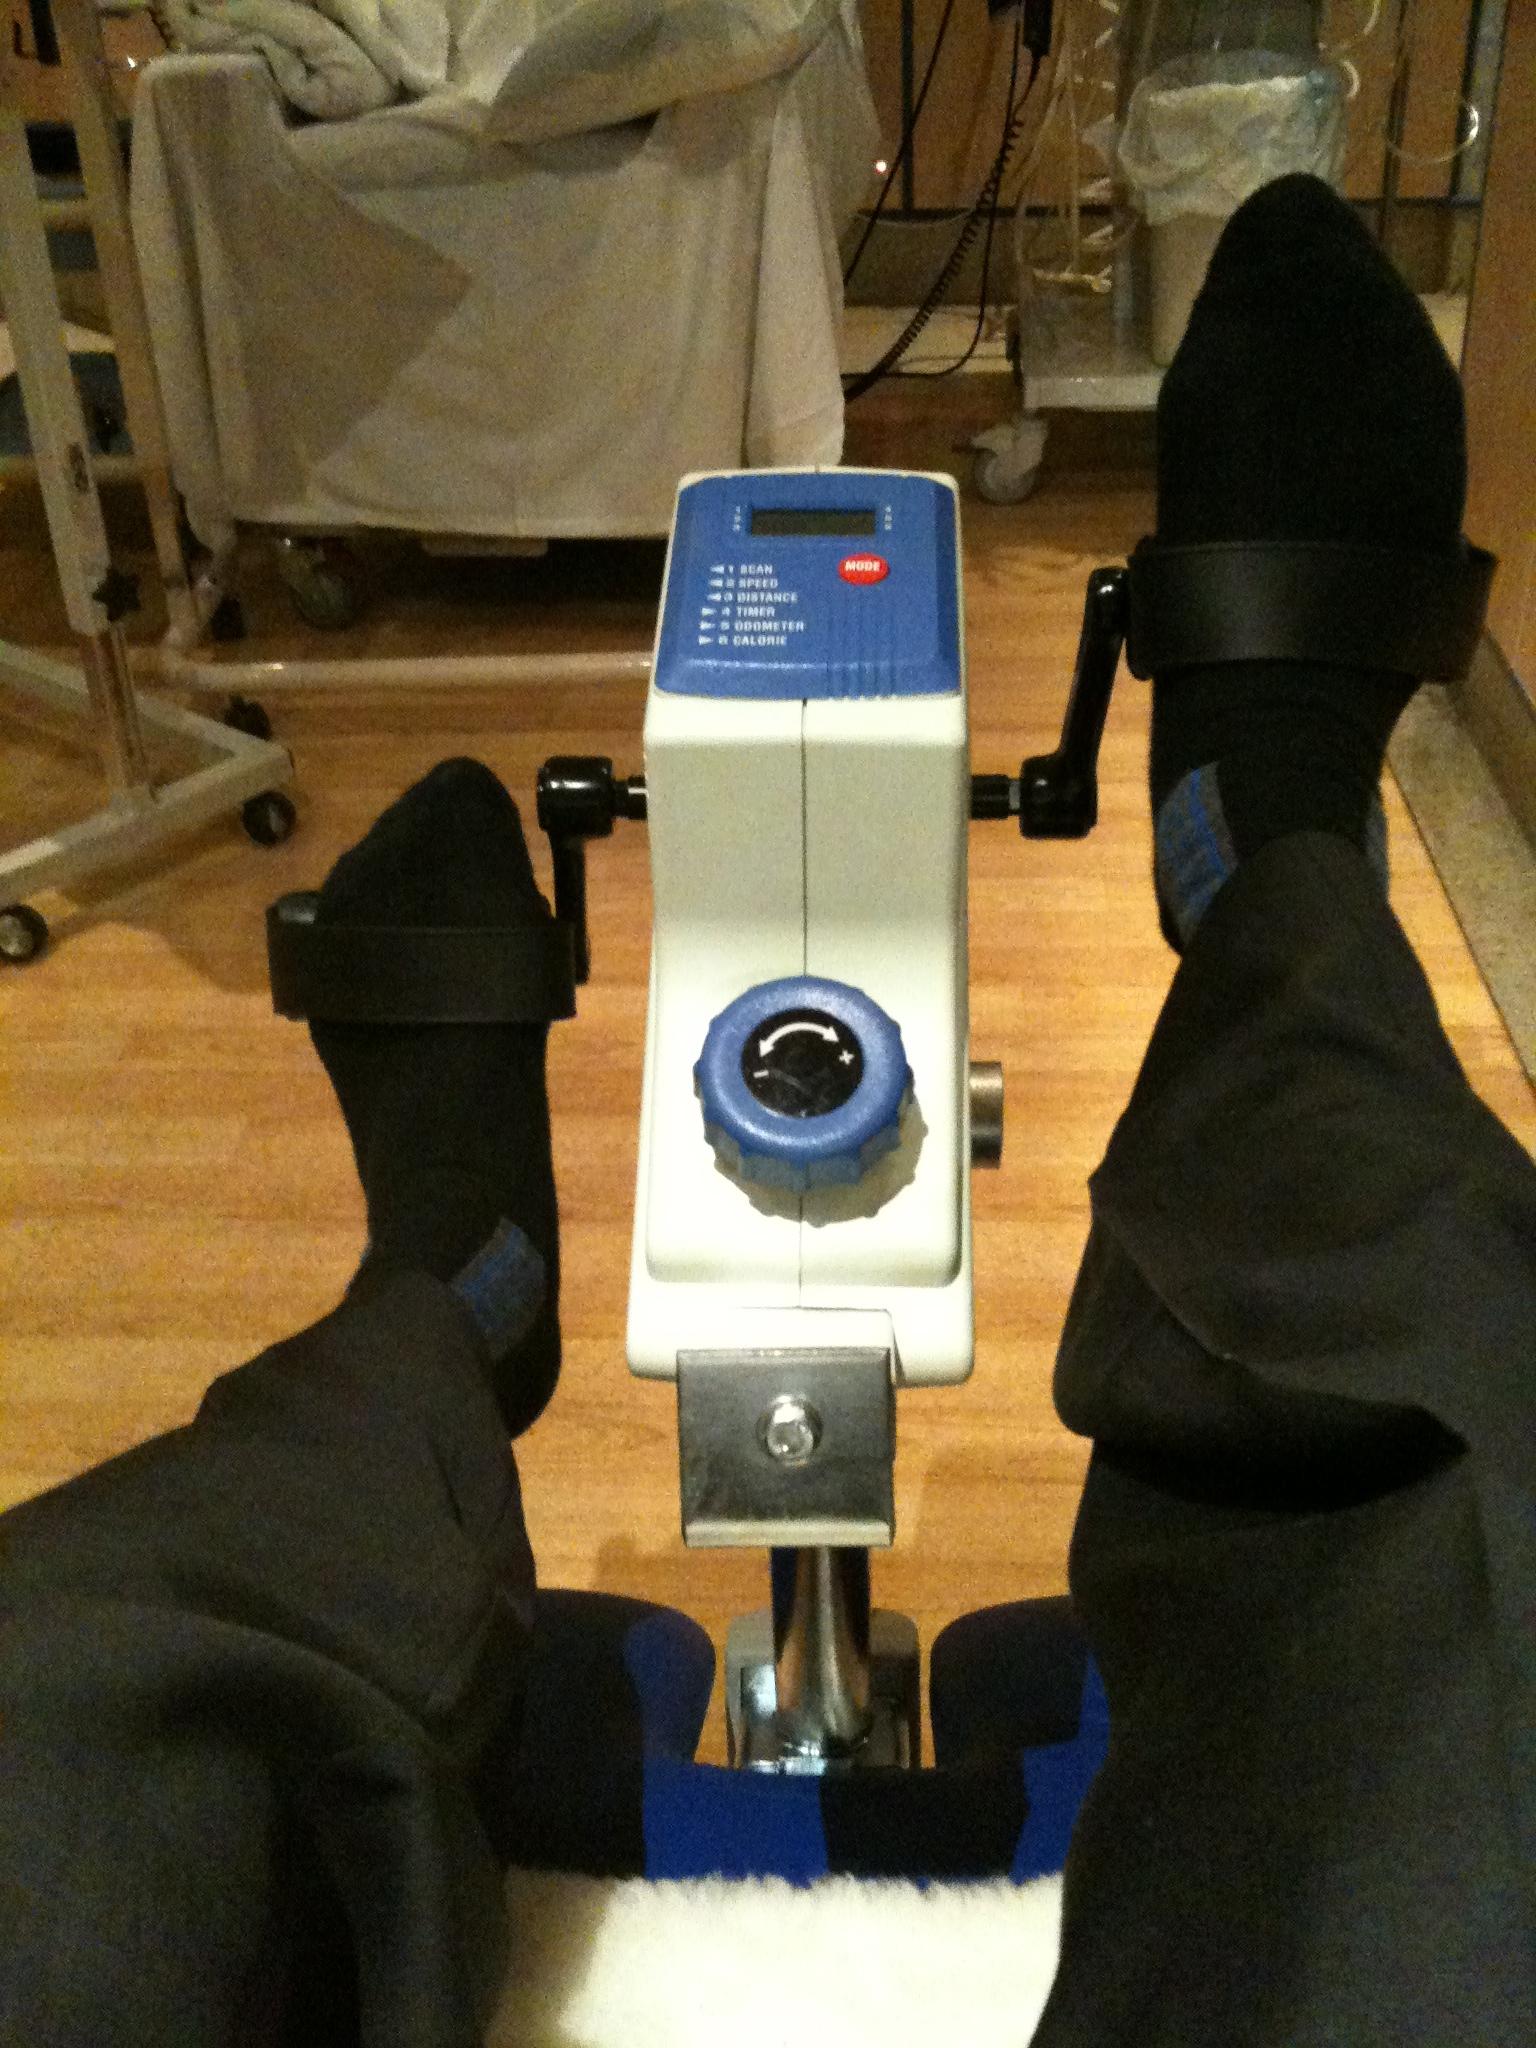 Using the Exerciser